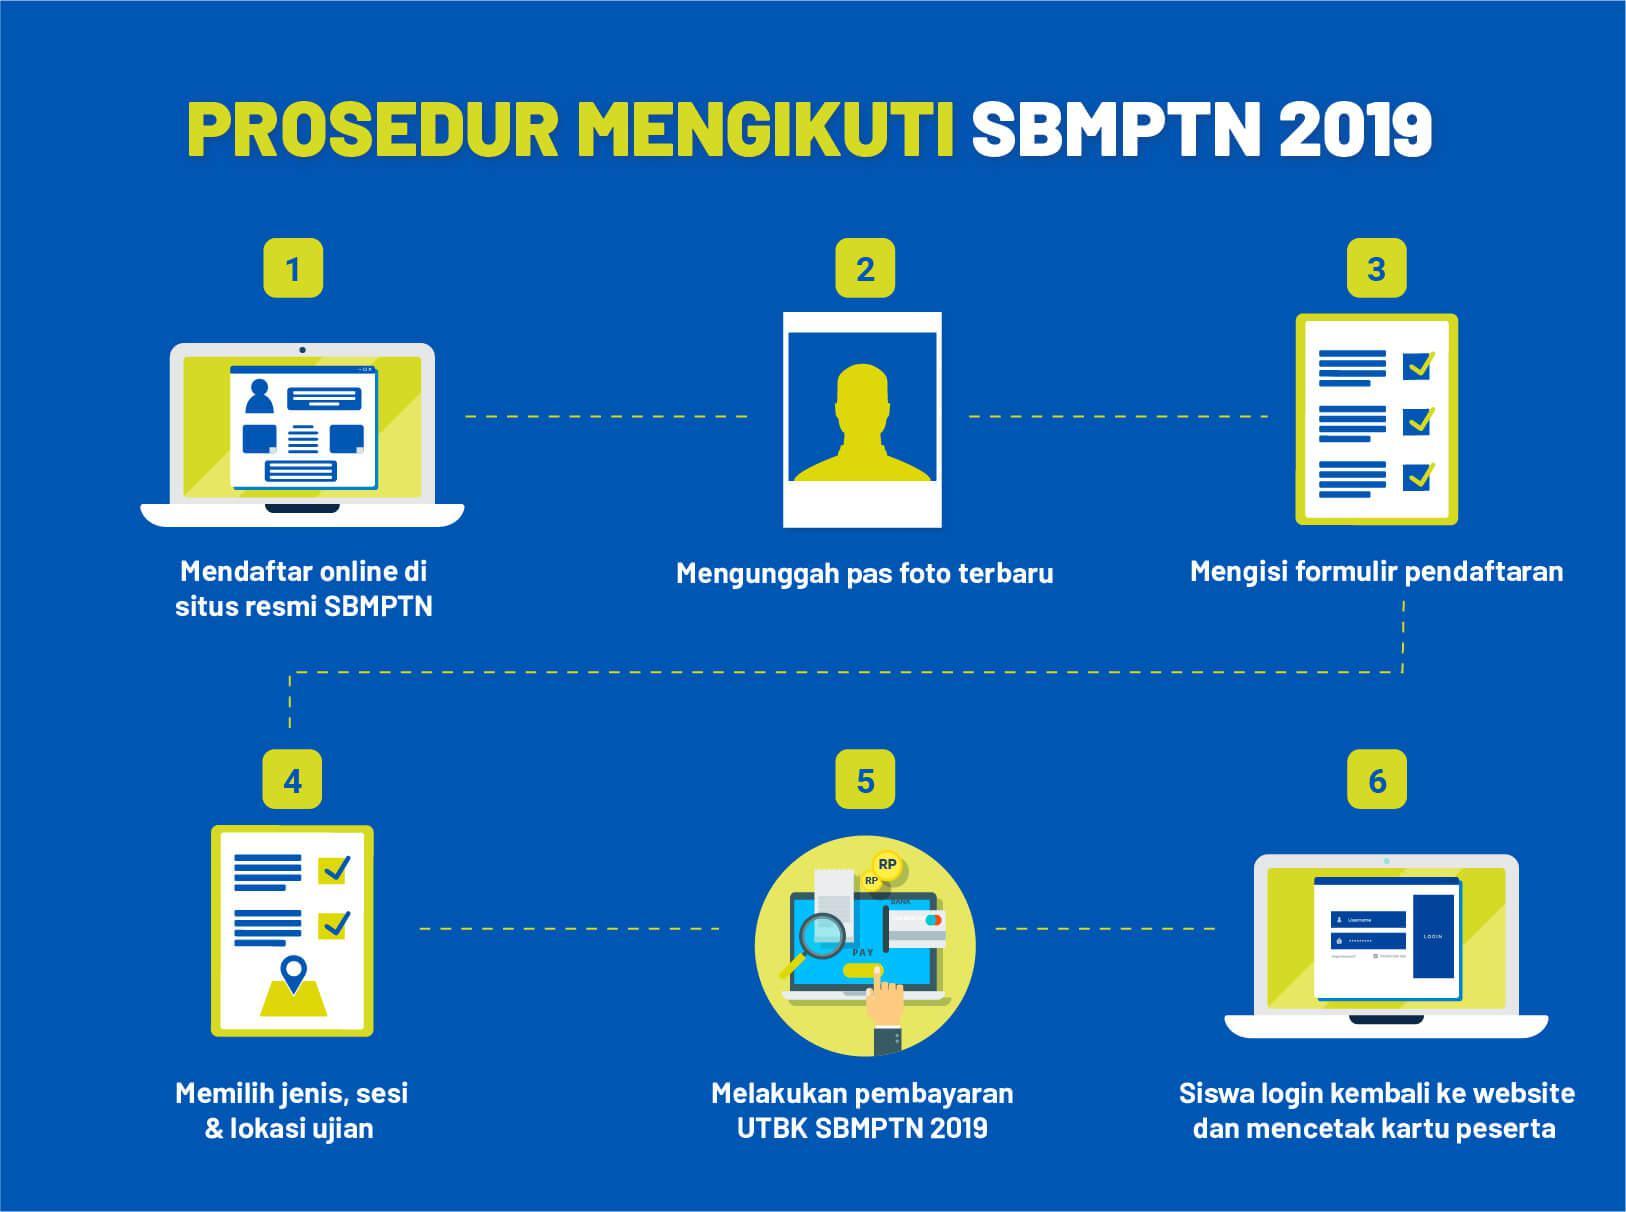 Prosedur Mengikuti UTBK SBMPTN 2019